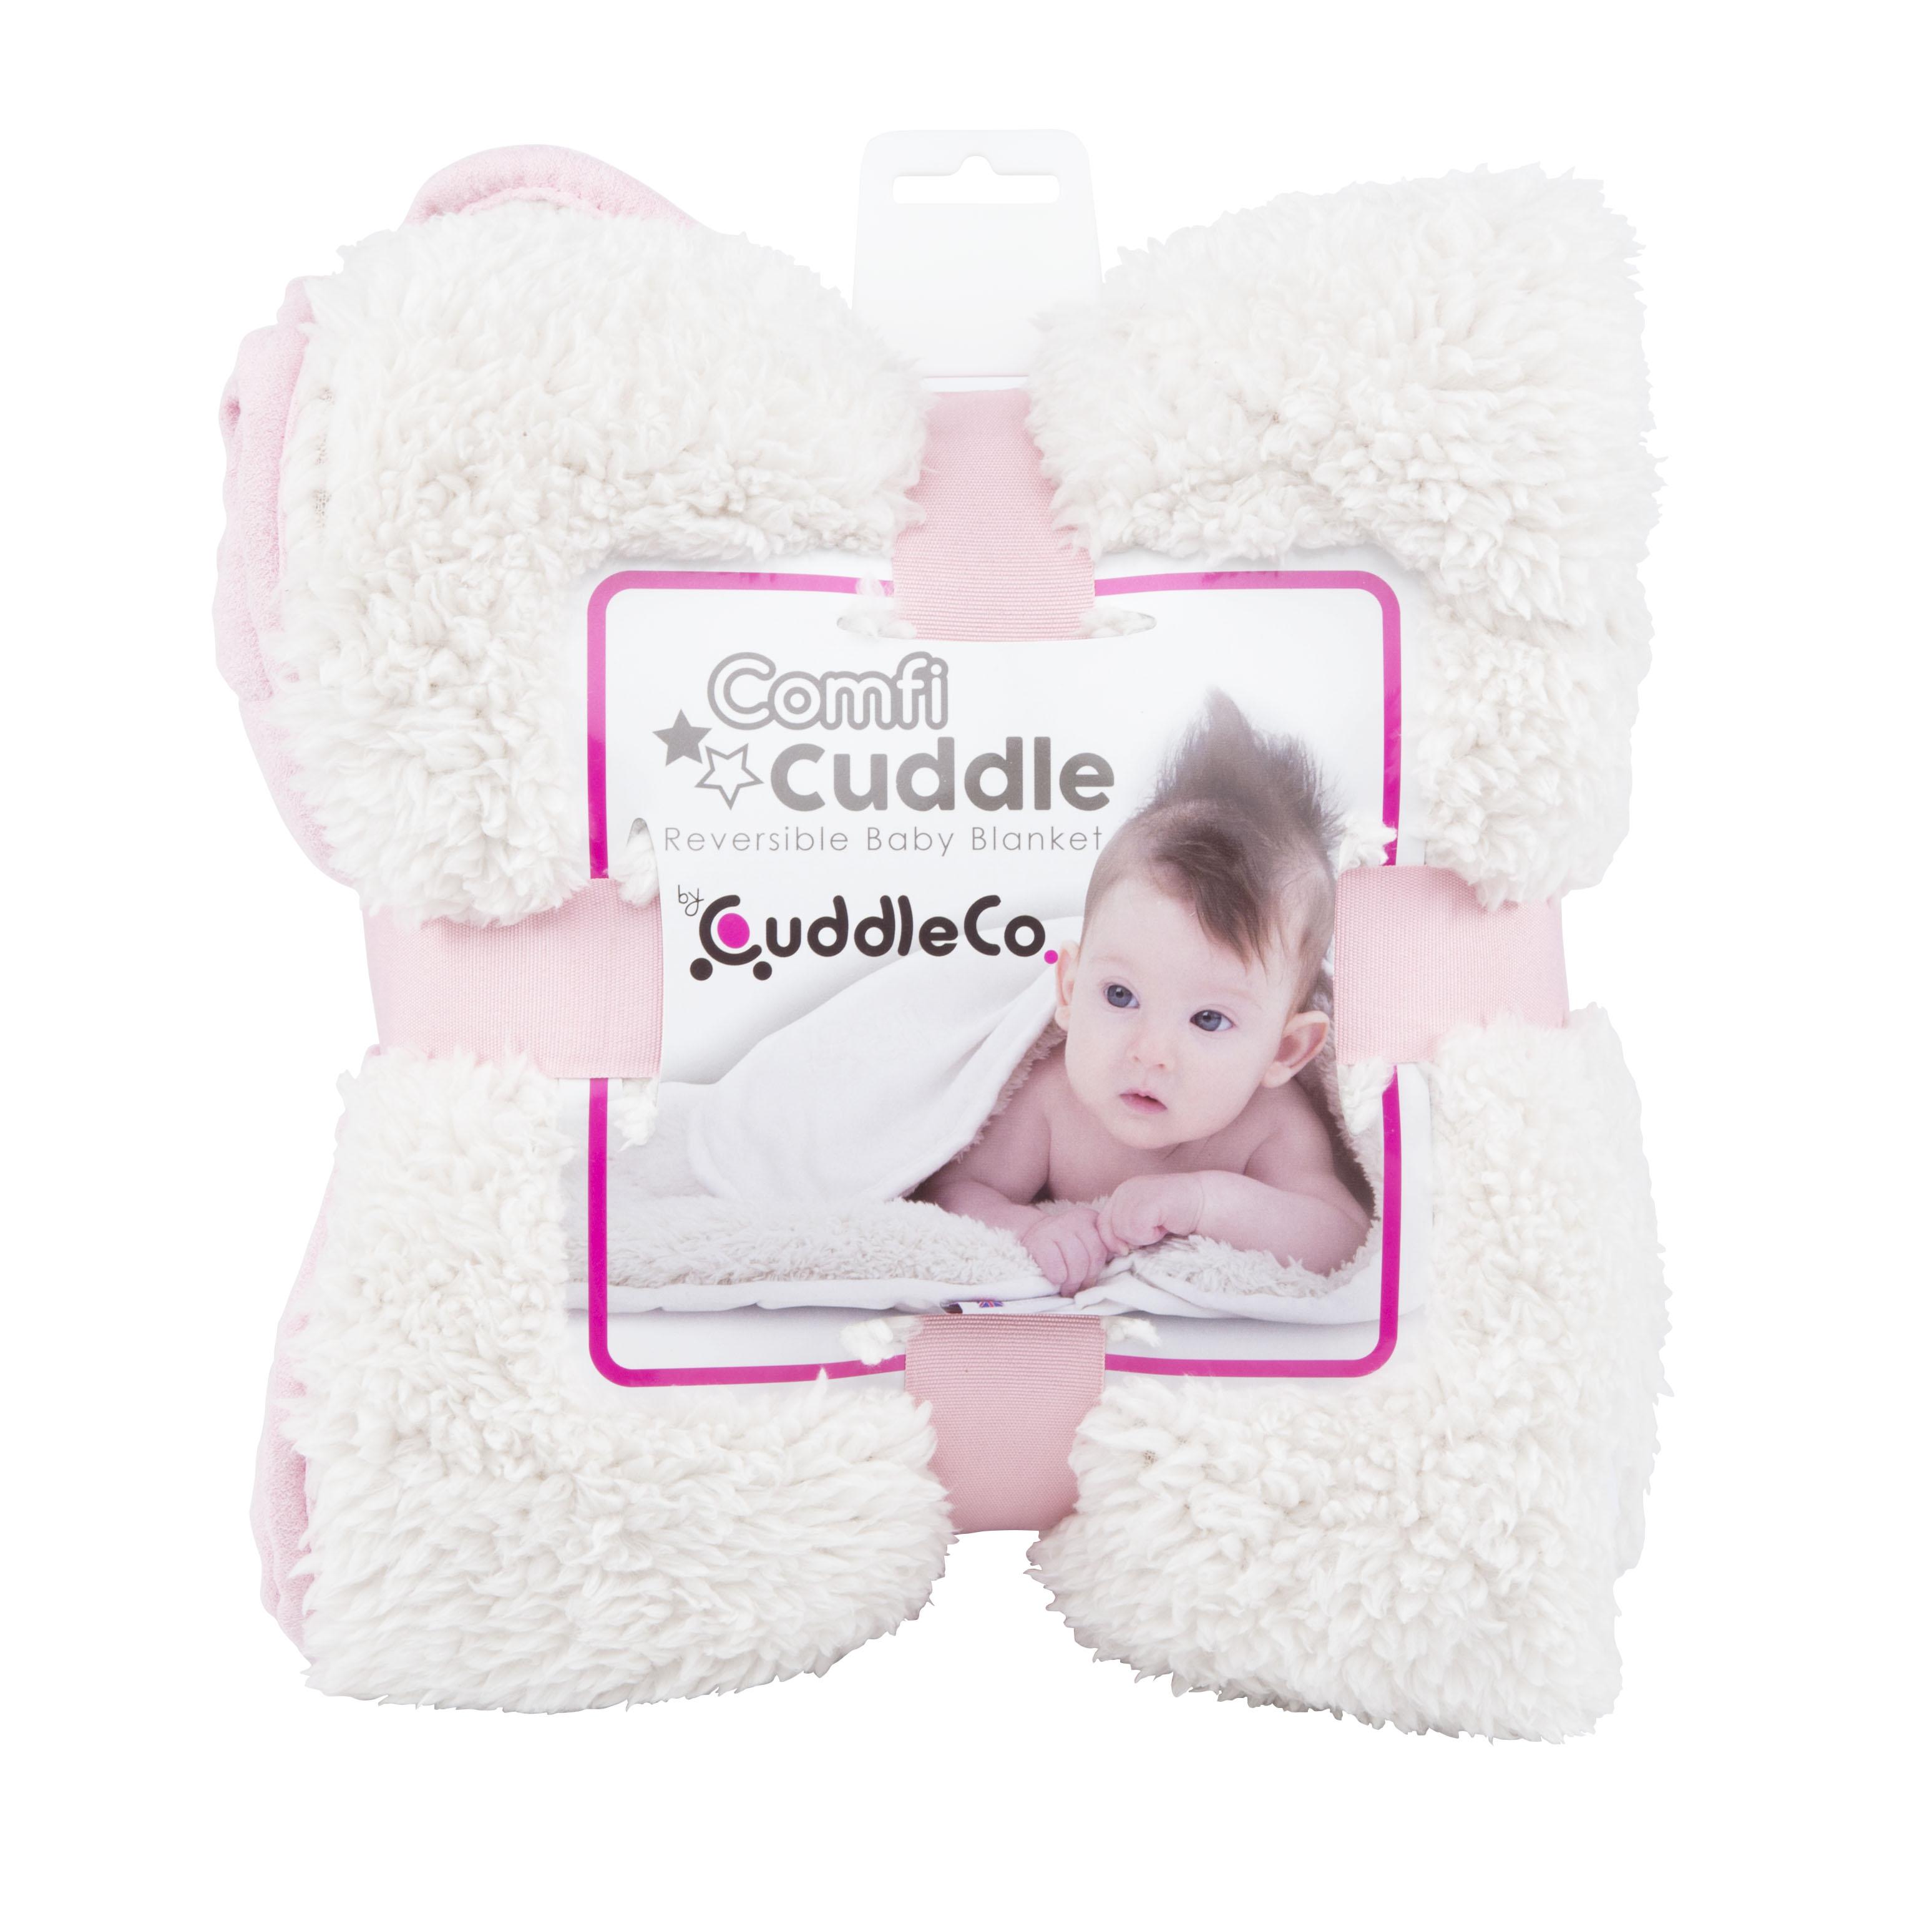 Dětská deka Comfi-Cuddle 110x75cm, Blush